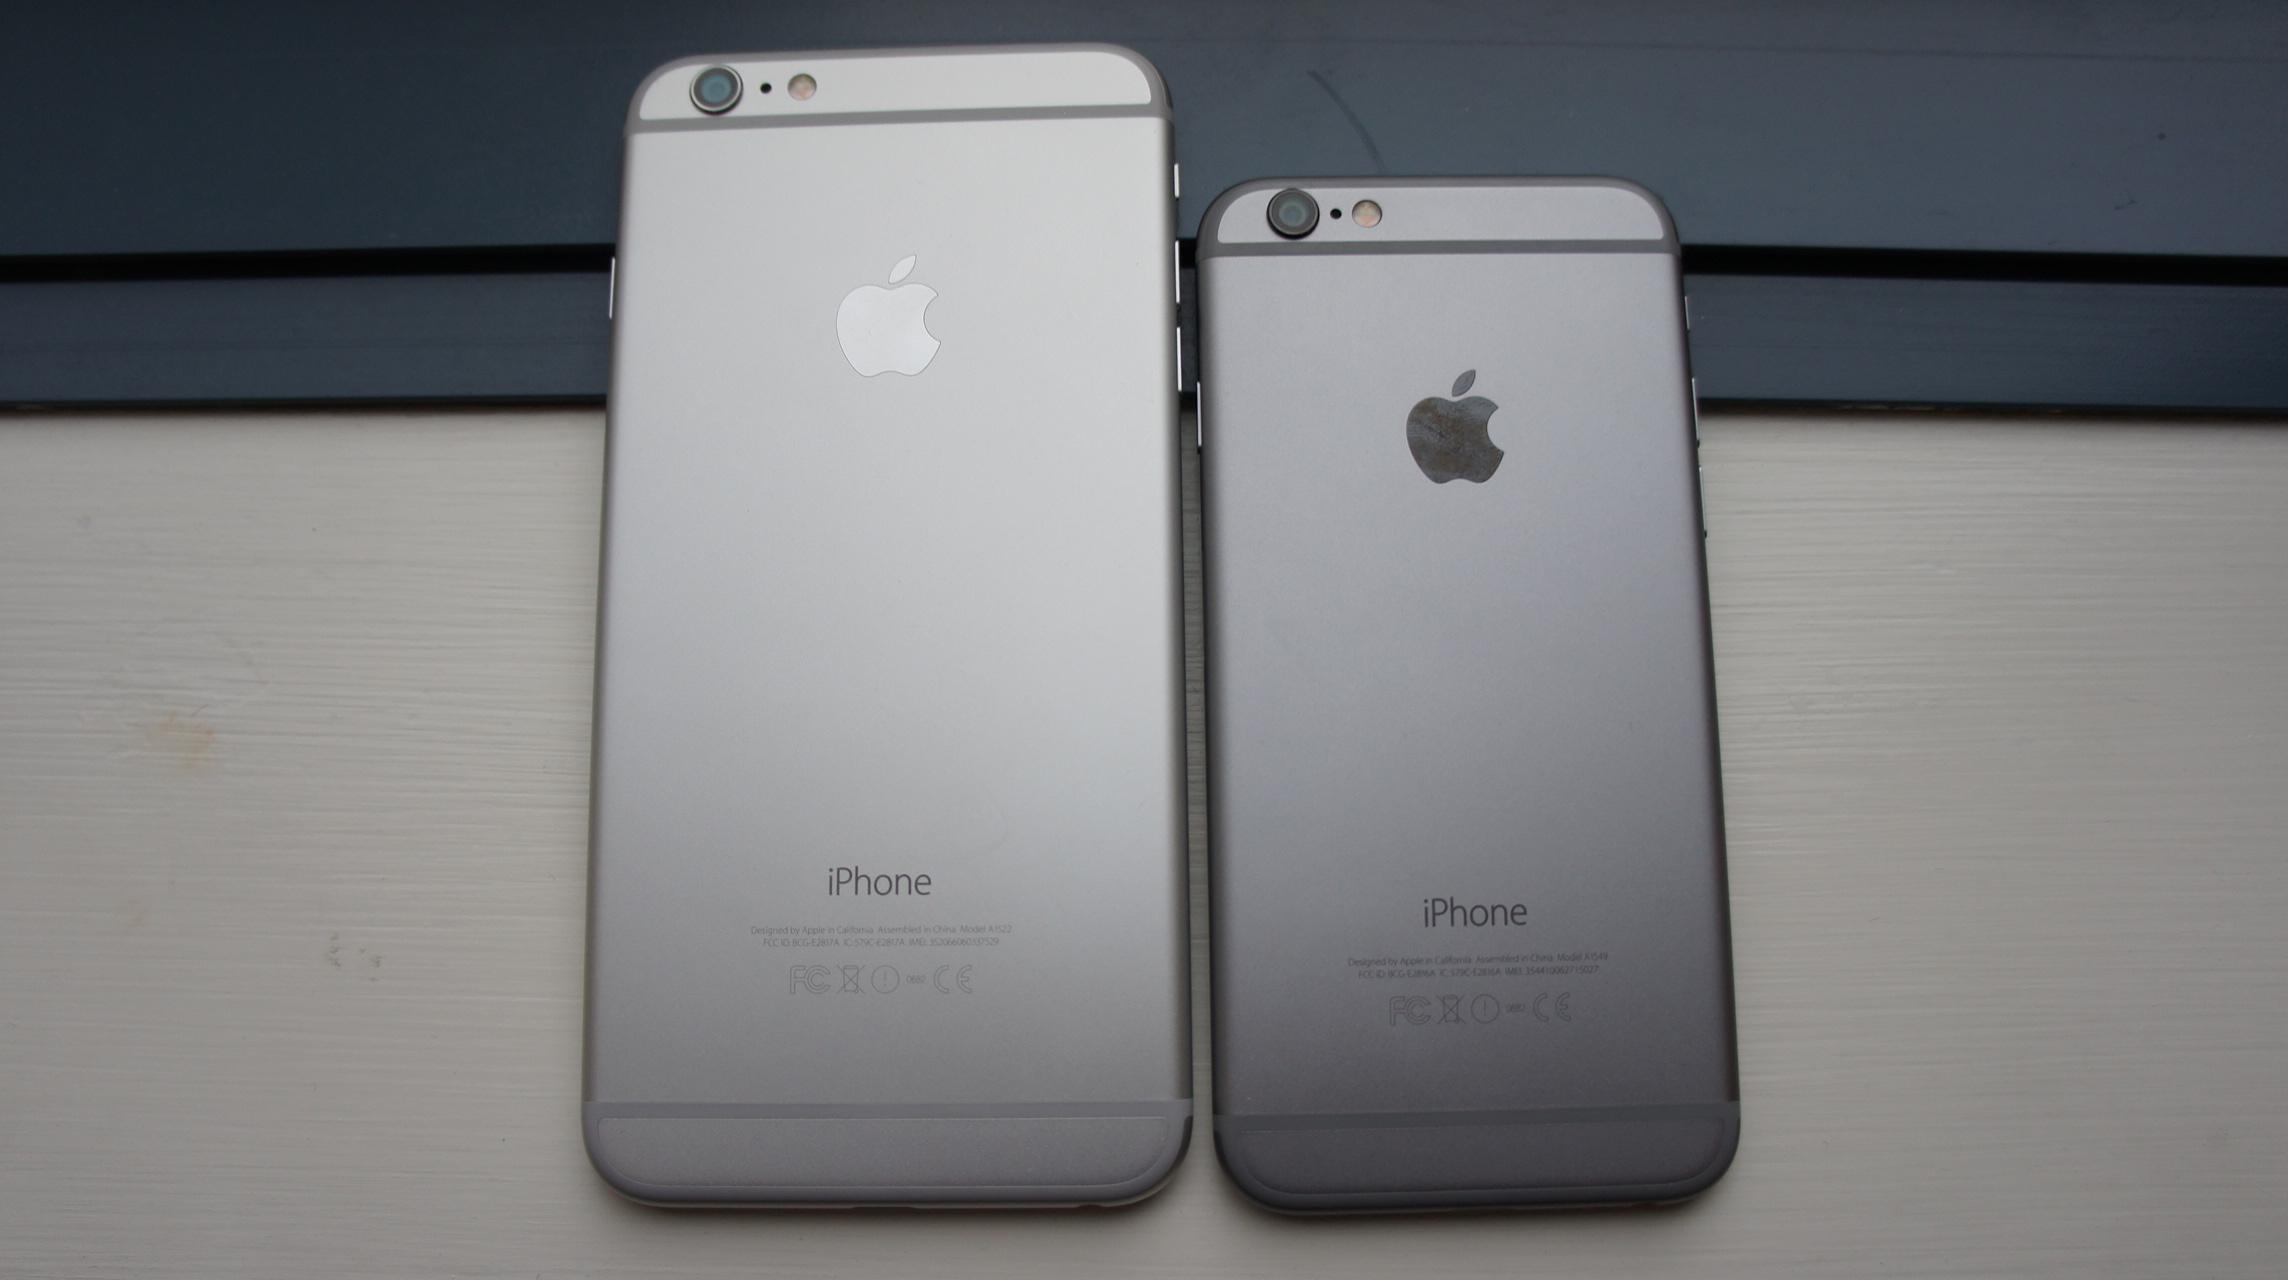 Primeiras impressões: iPhone 6 e iPhone 6 Plus